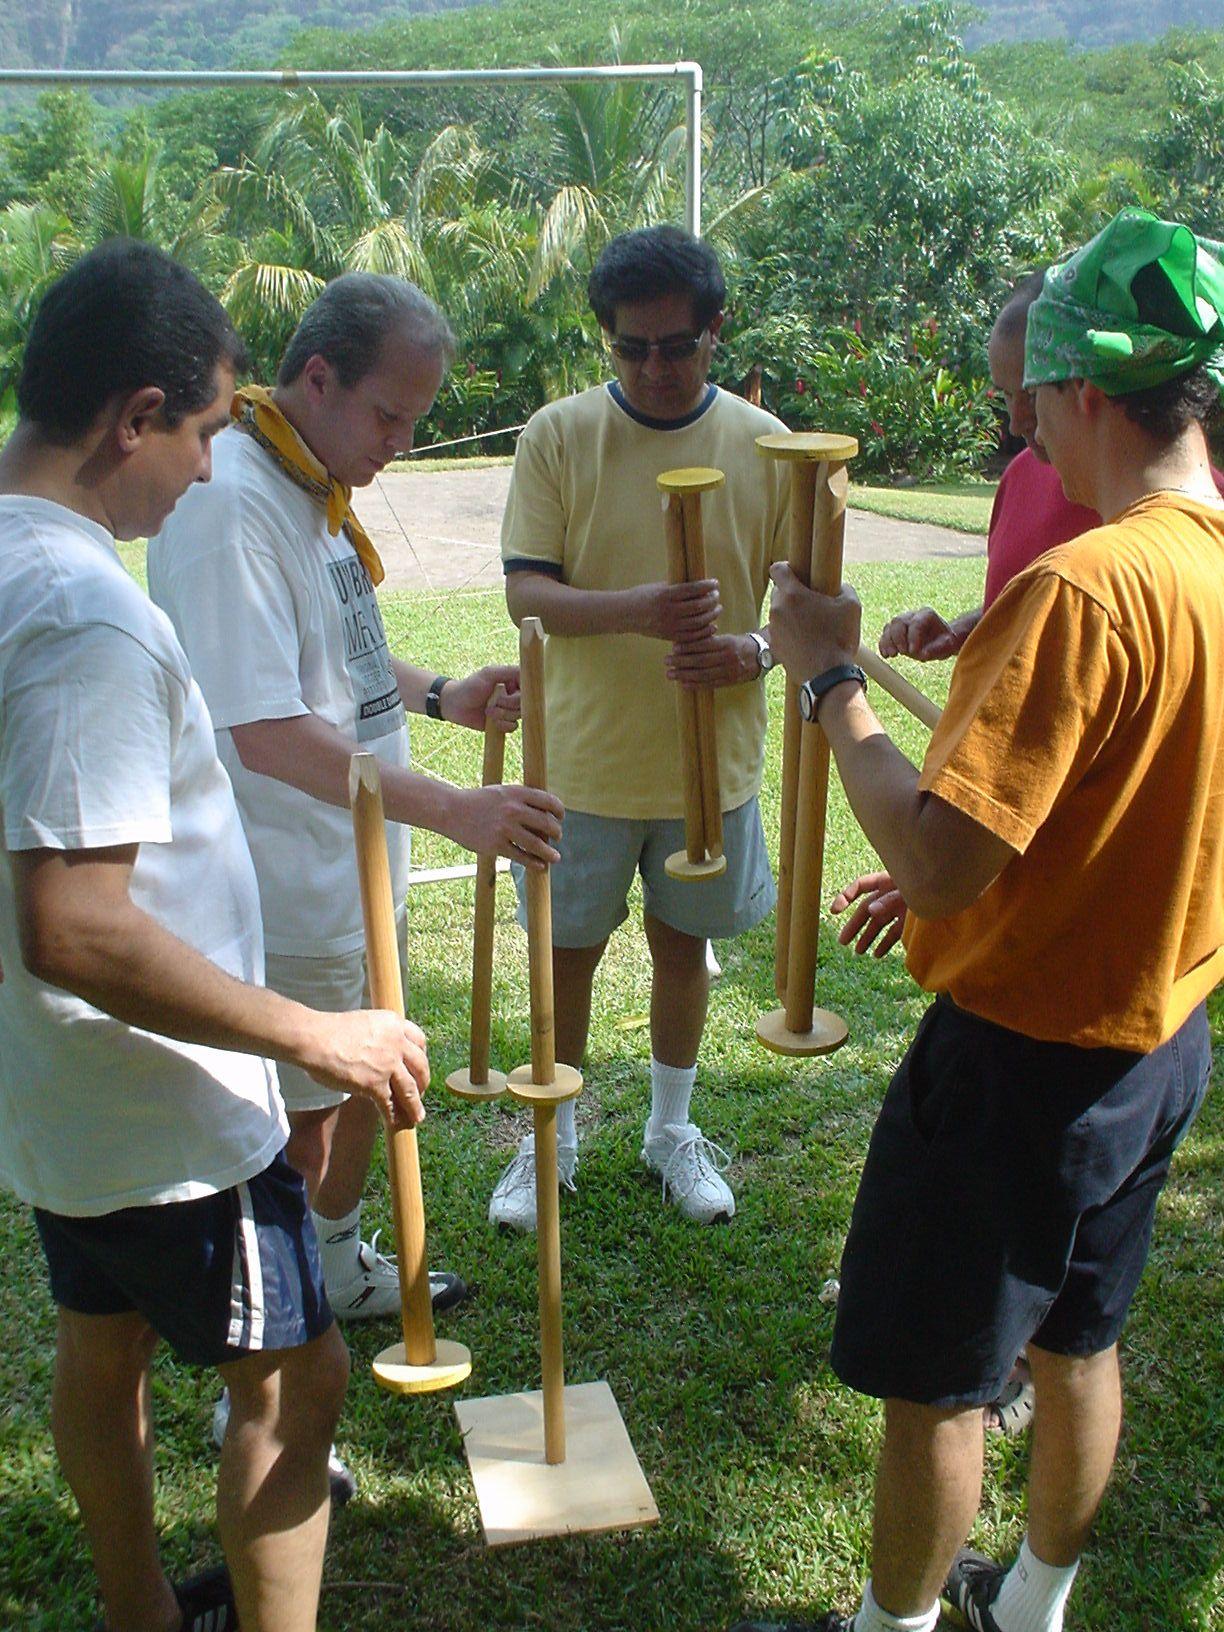 Paquete Empresarial Activo Participativo En Jalcomulco Veracruz Rio Pescados